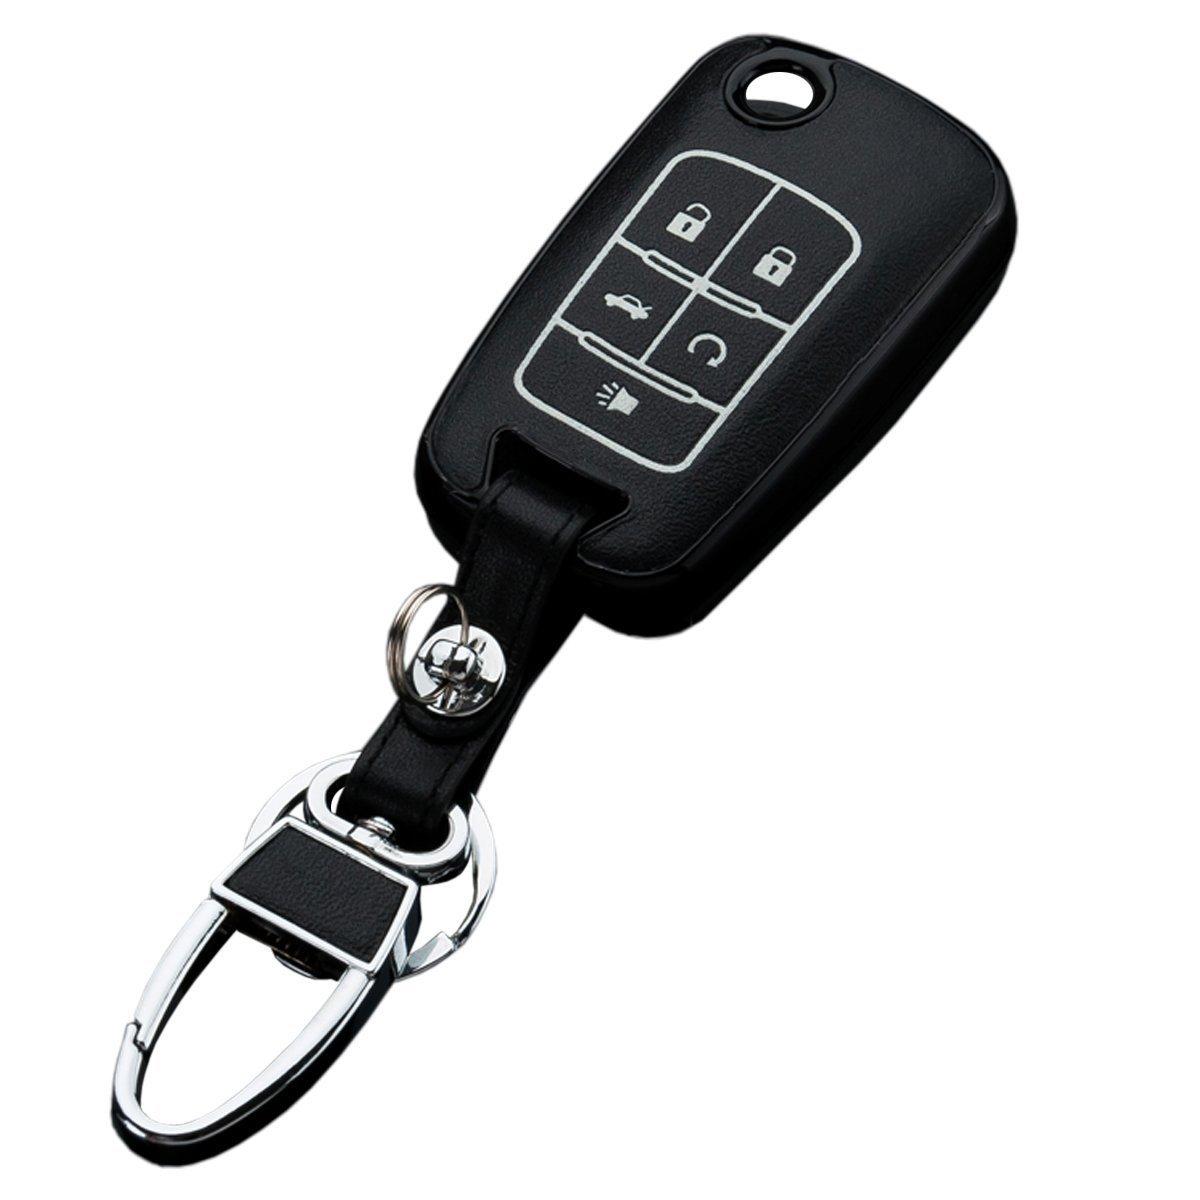 Sakali Car Key Case Cover for Chevrolet Car Folding Key Holder Keychain Leather Black